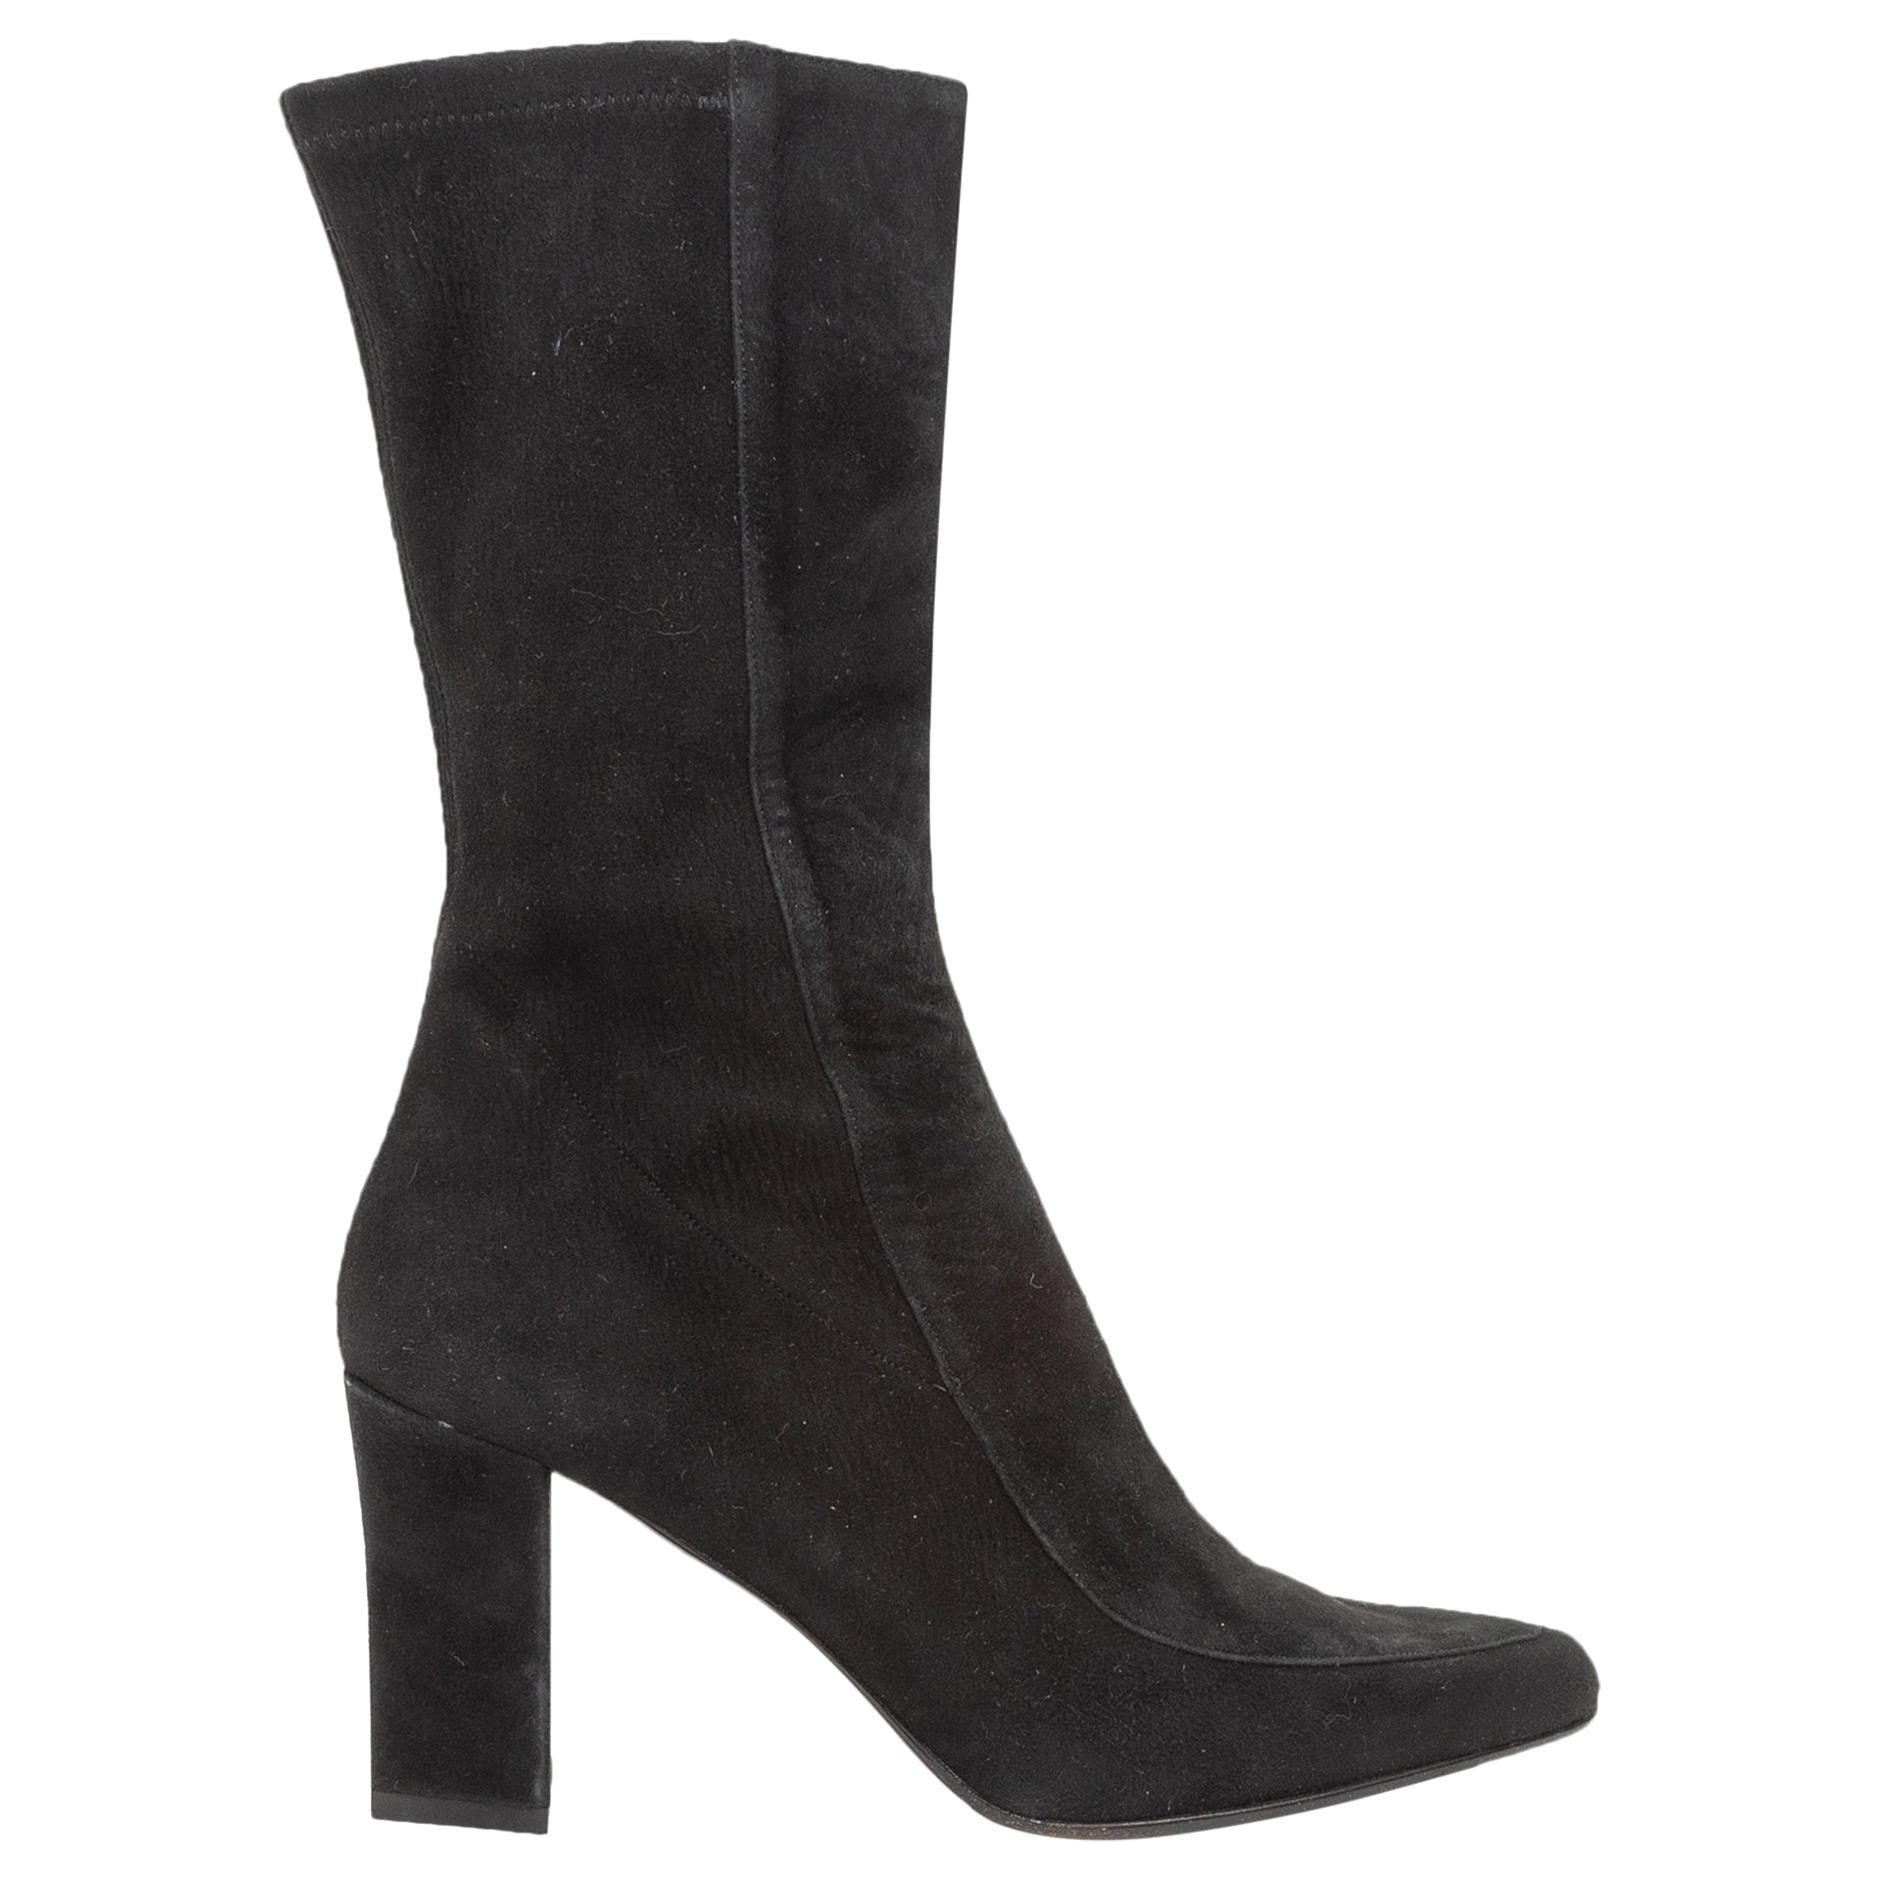 Ralph Lauren Black Suede Pointed-Toe Boots